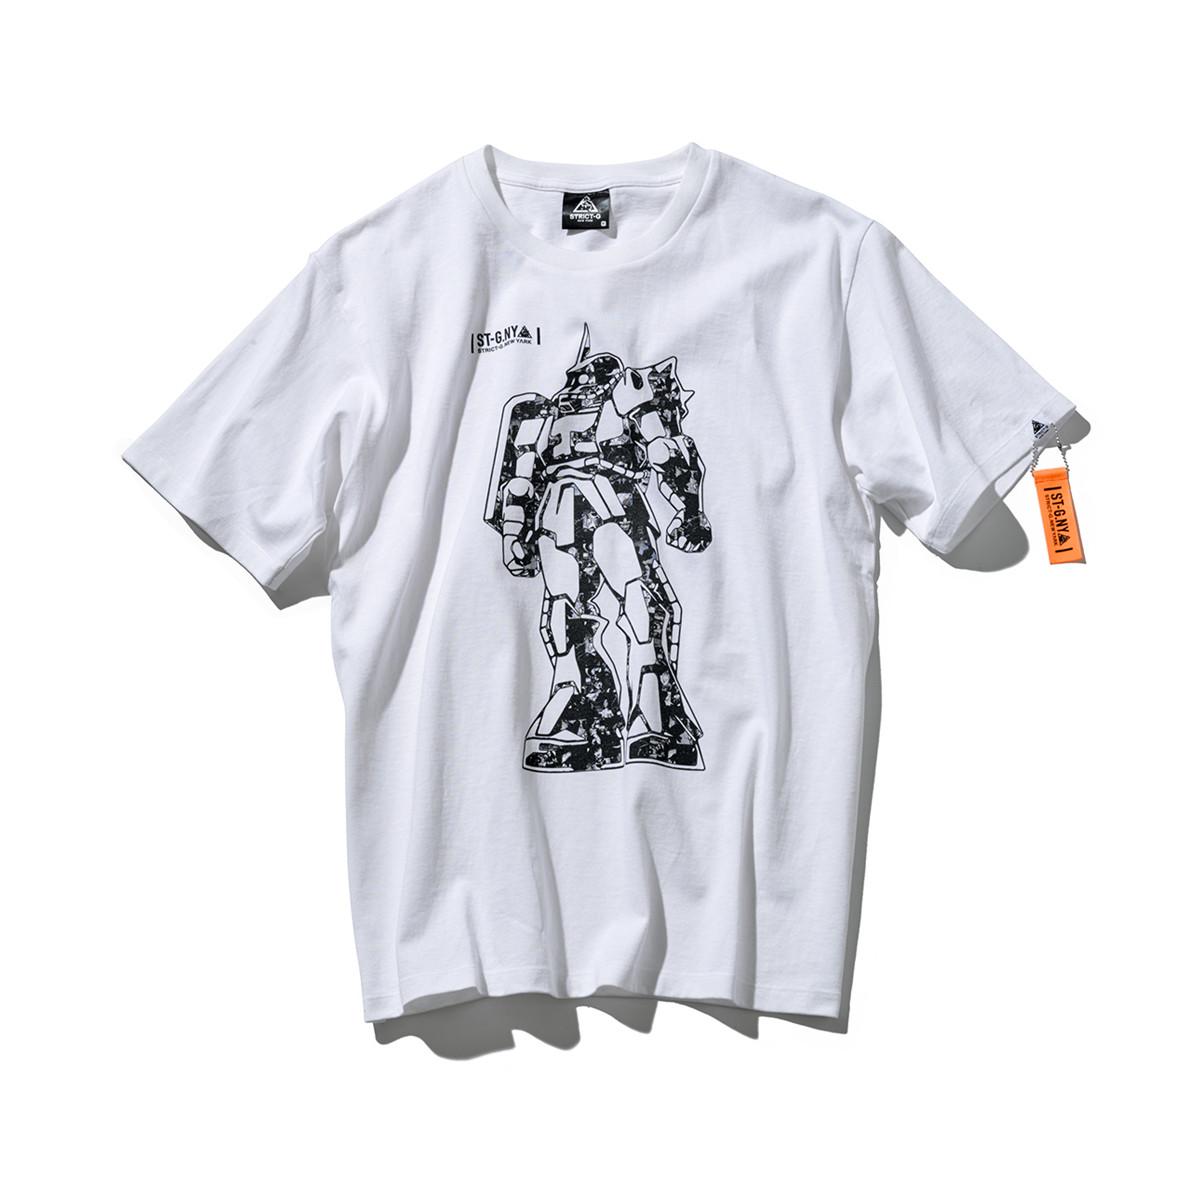 Zaku T-shirt—Mobile Suit Gundam/STRICT-G NEW YARK Collaboration